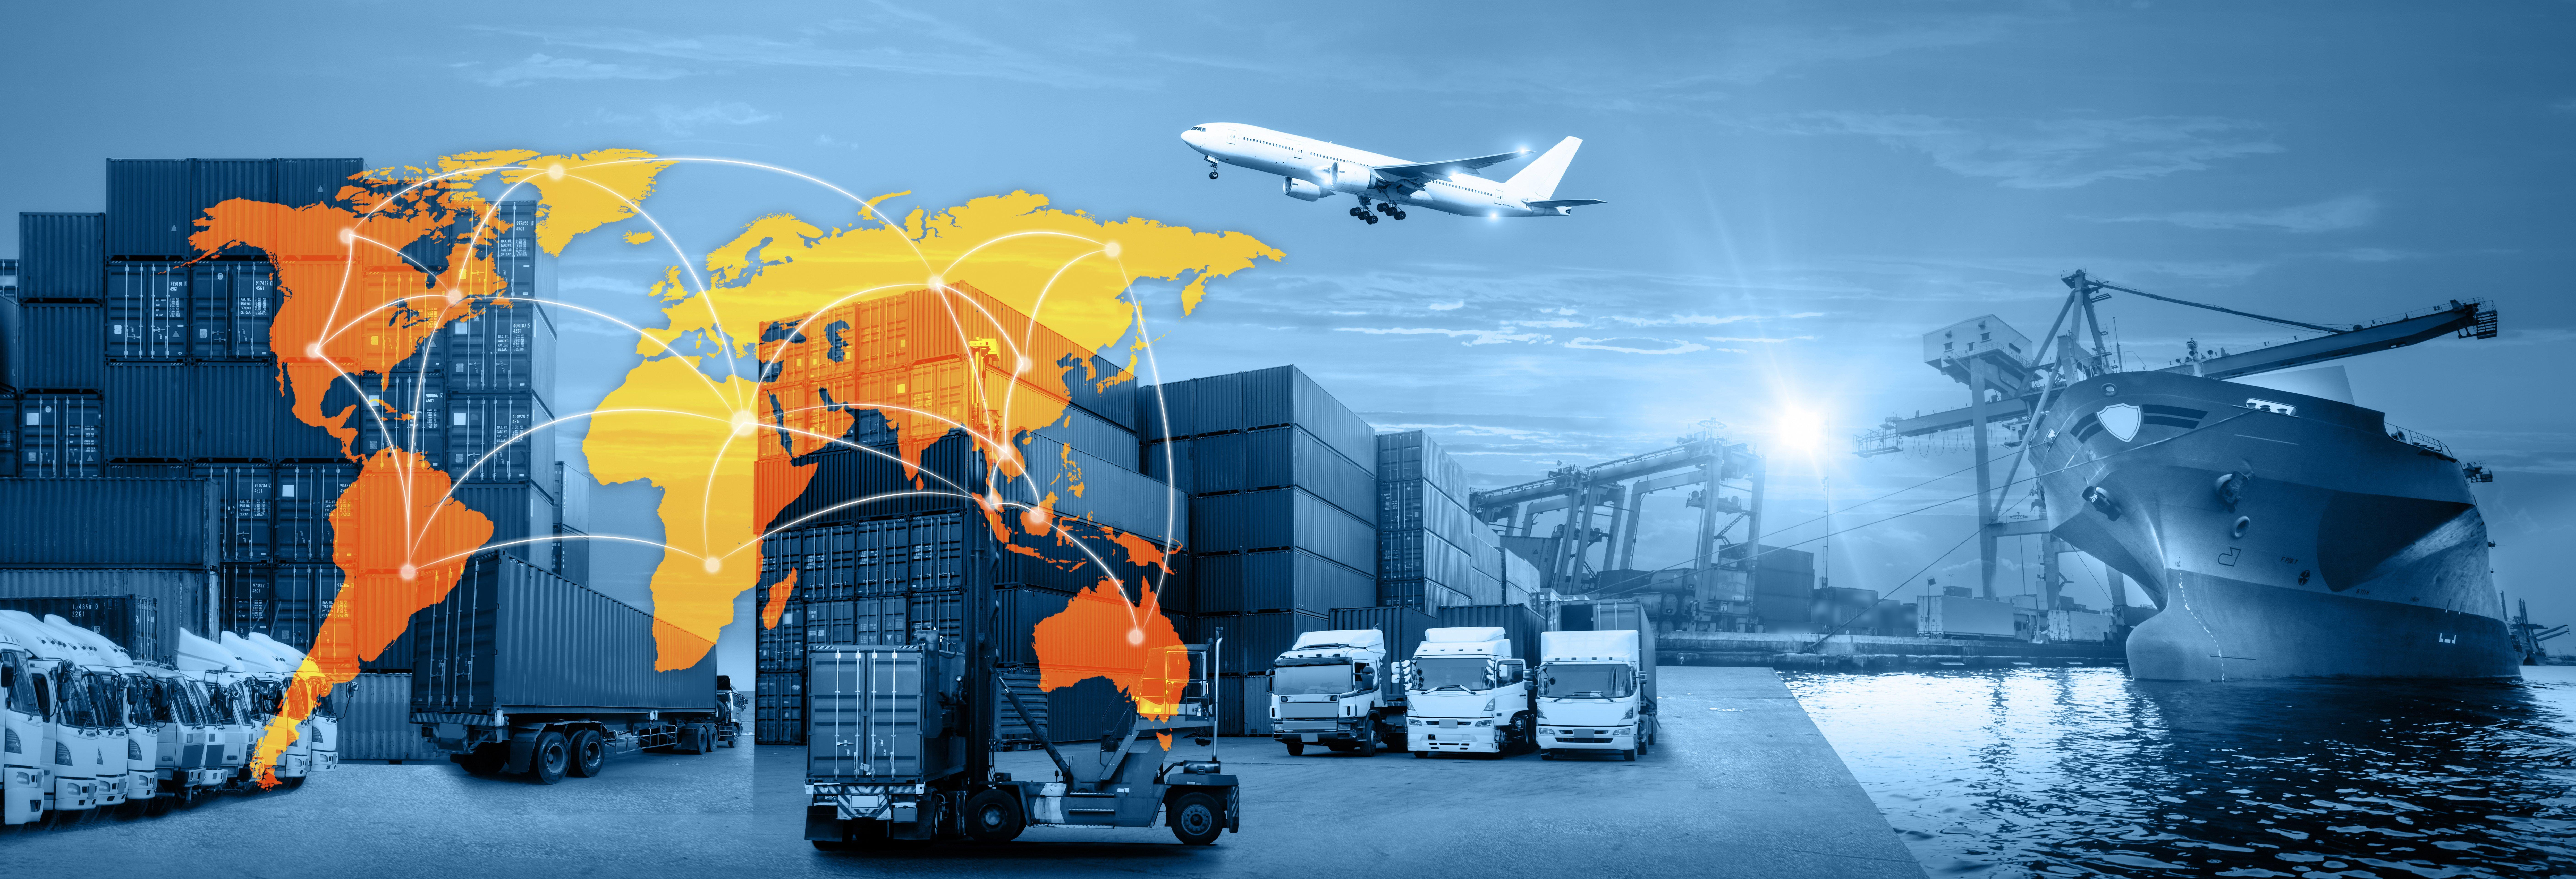 truck container plane ship loigstics